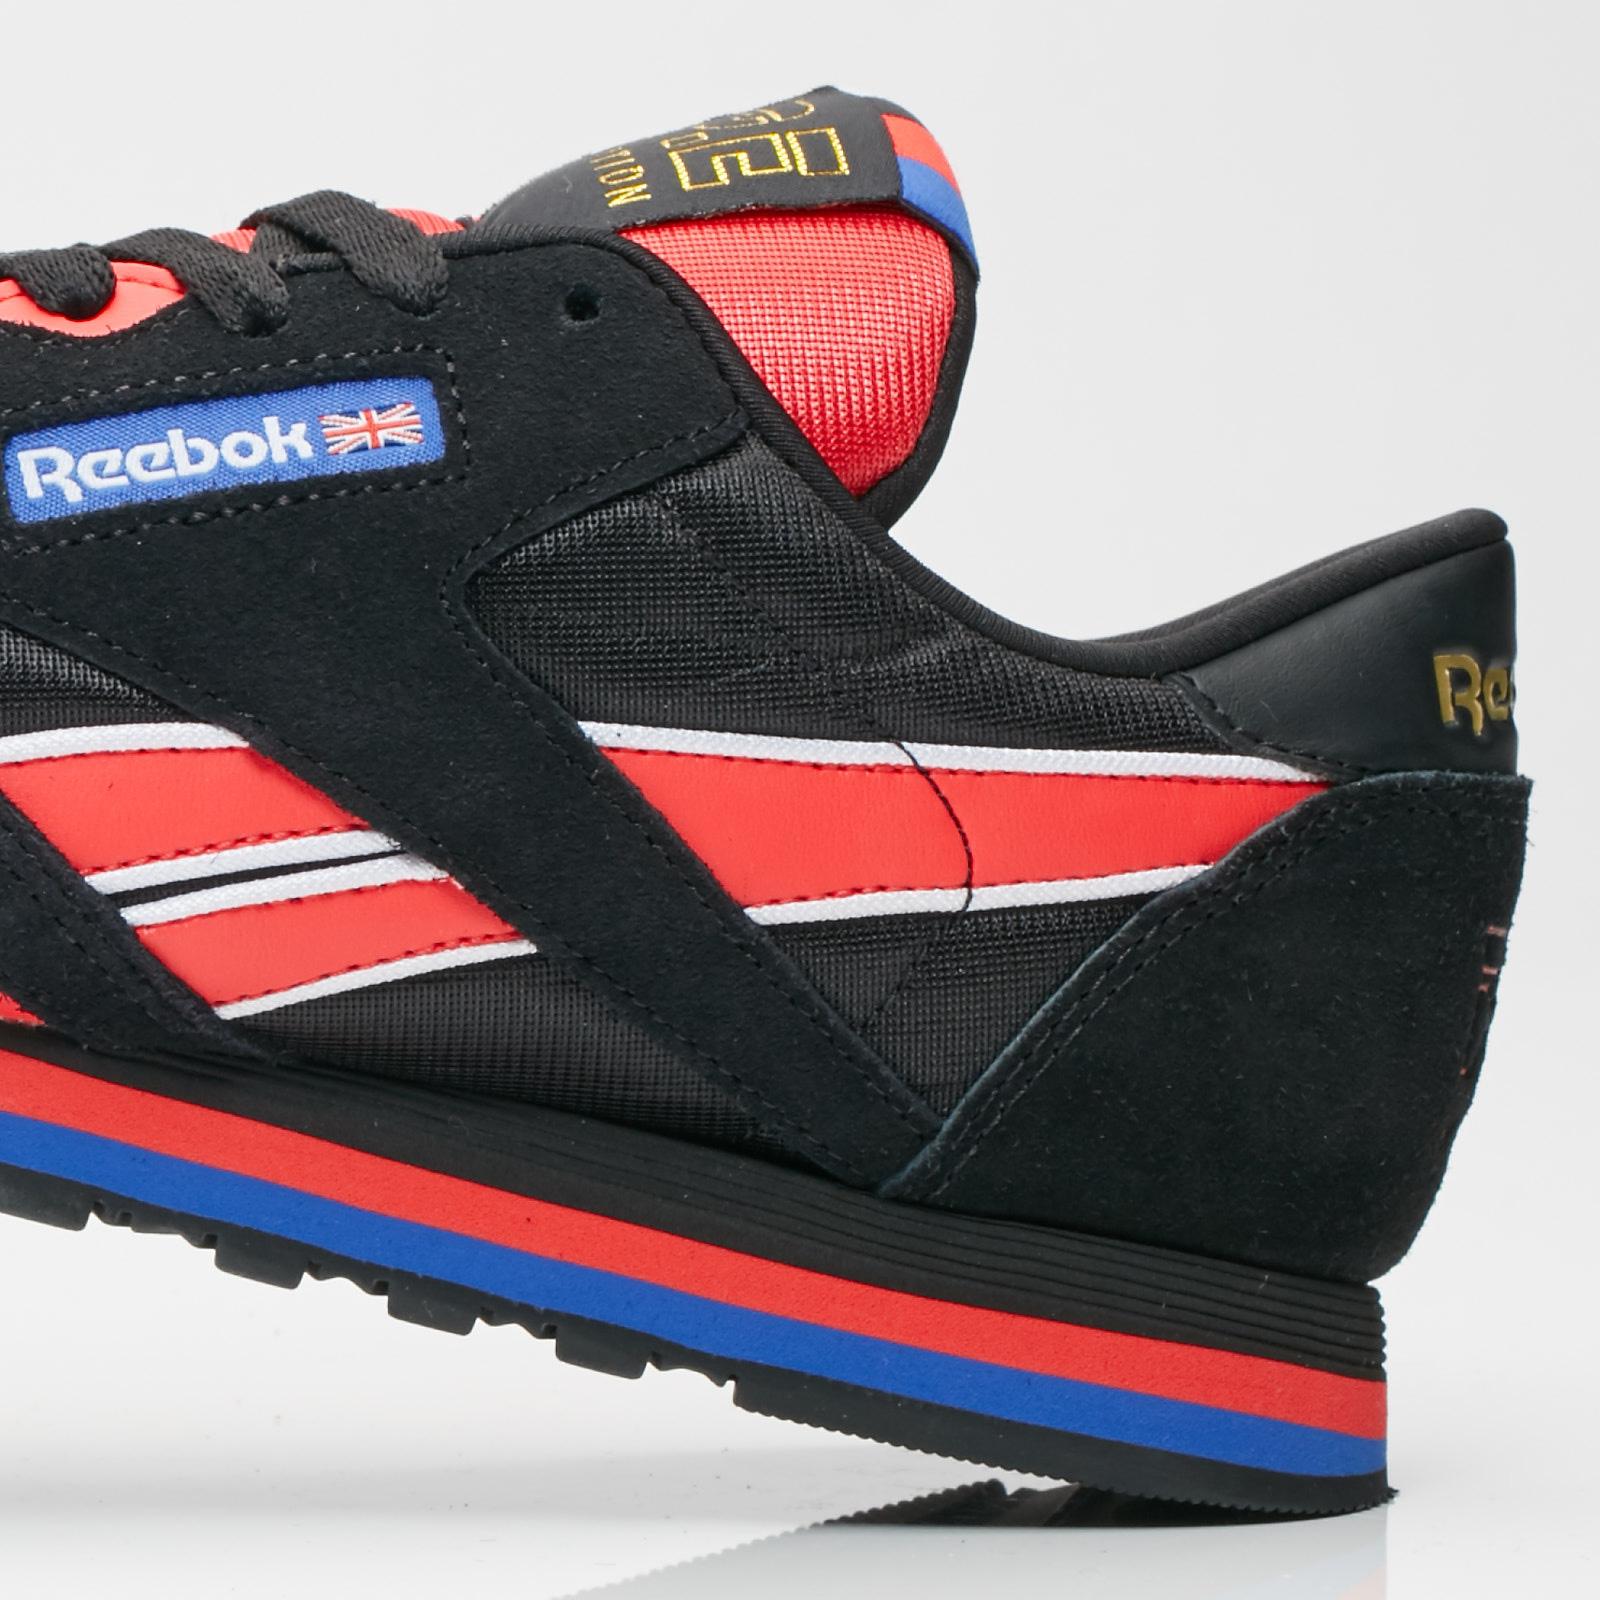 2317457563a165 Reebok Classic Leather Nylon P.E Nation - Cn3905 - Sneakersnstuff ...